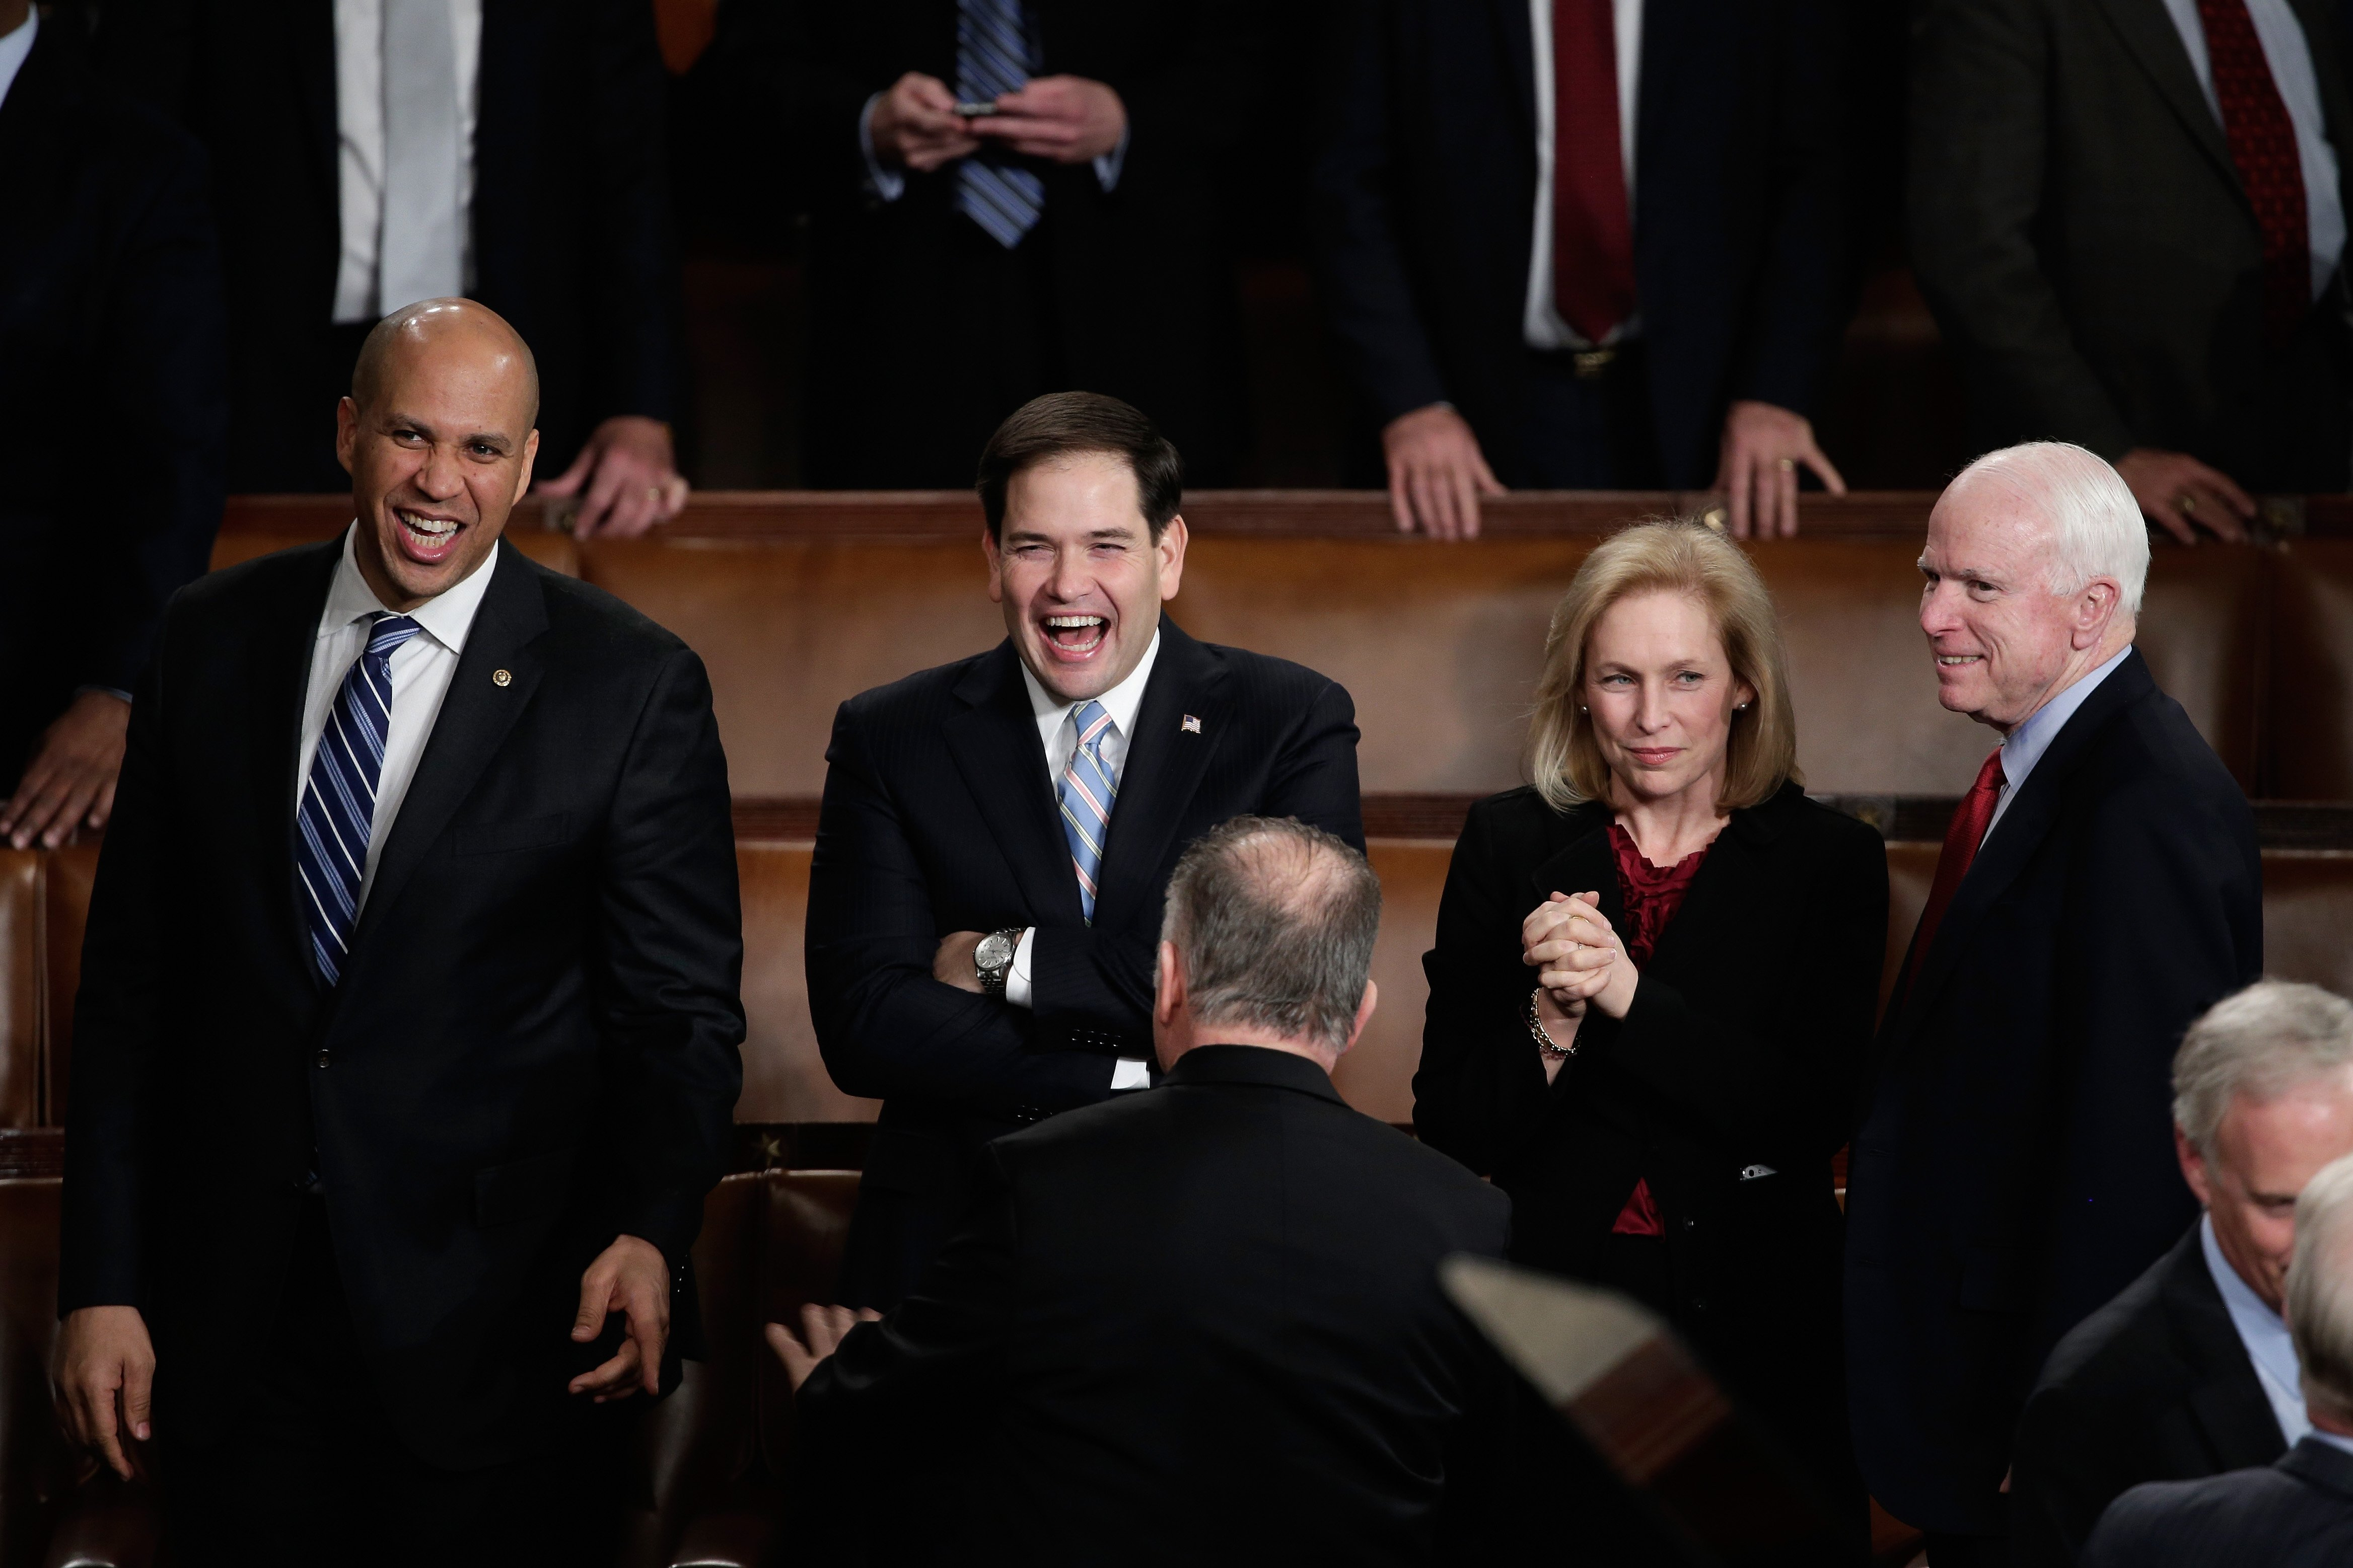 Senators Cory Booker, Marco Rubio, Kristen Gillibrand, John McCain mingle before the State of the Union.